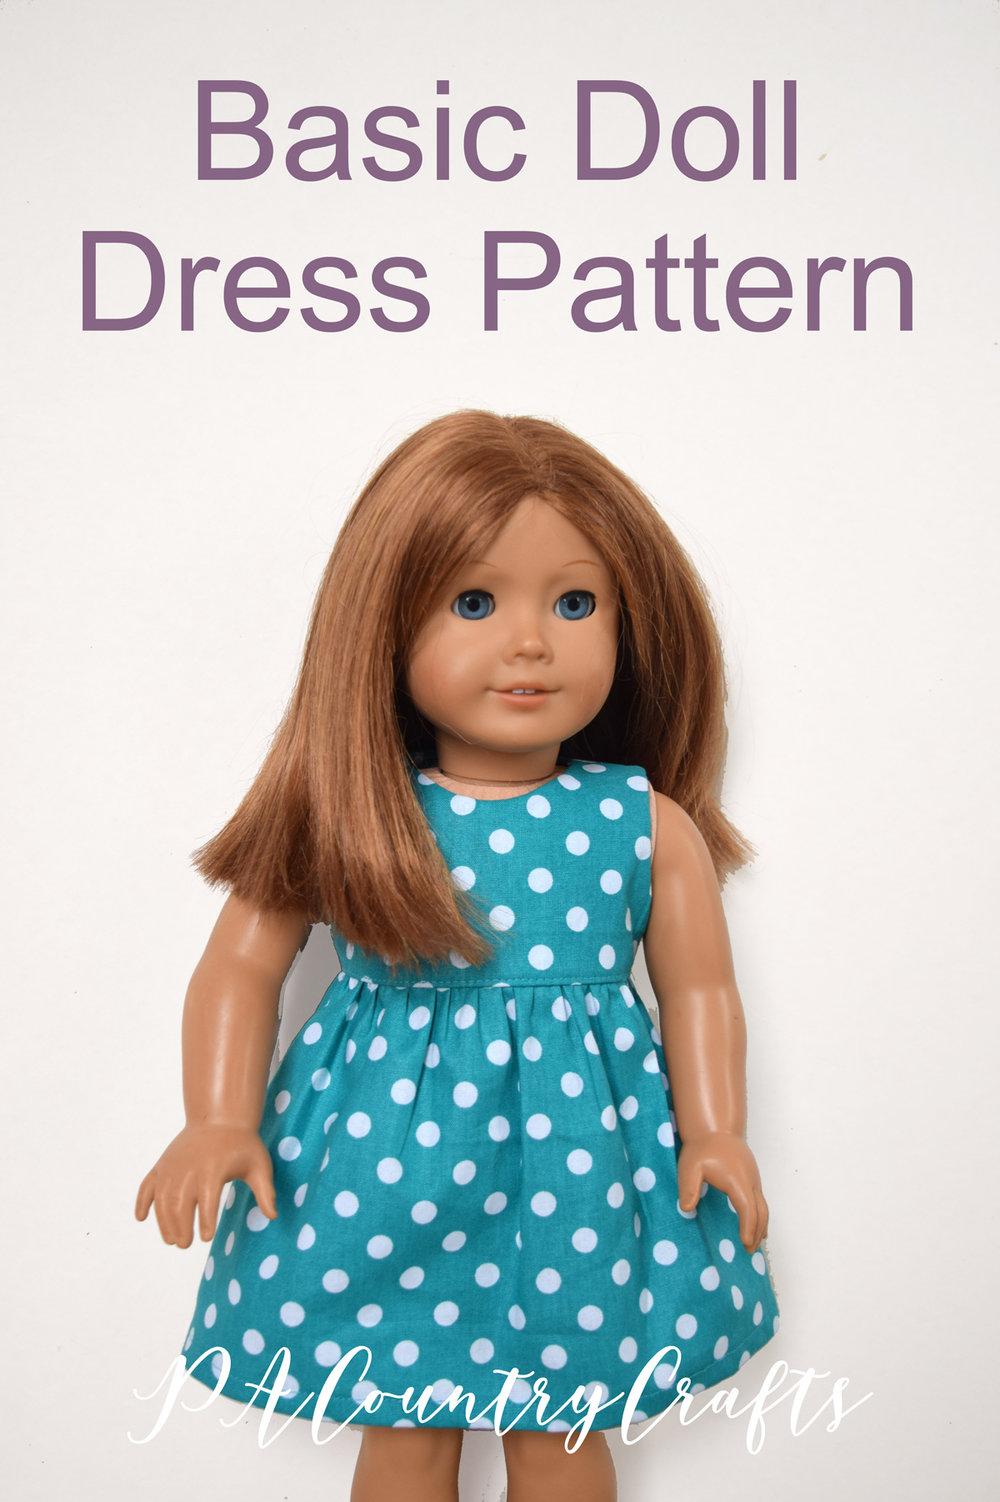 Basic Doll Dress Pattern Pacountrycrafts